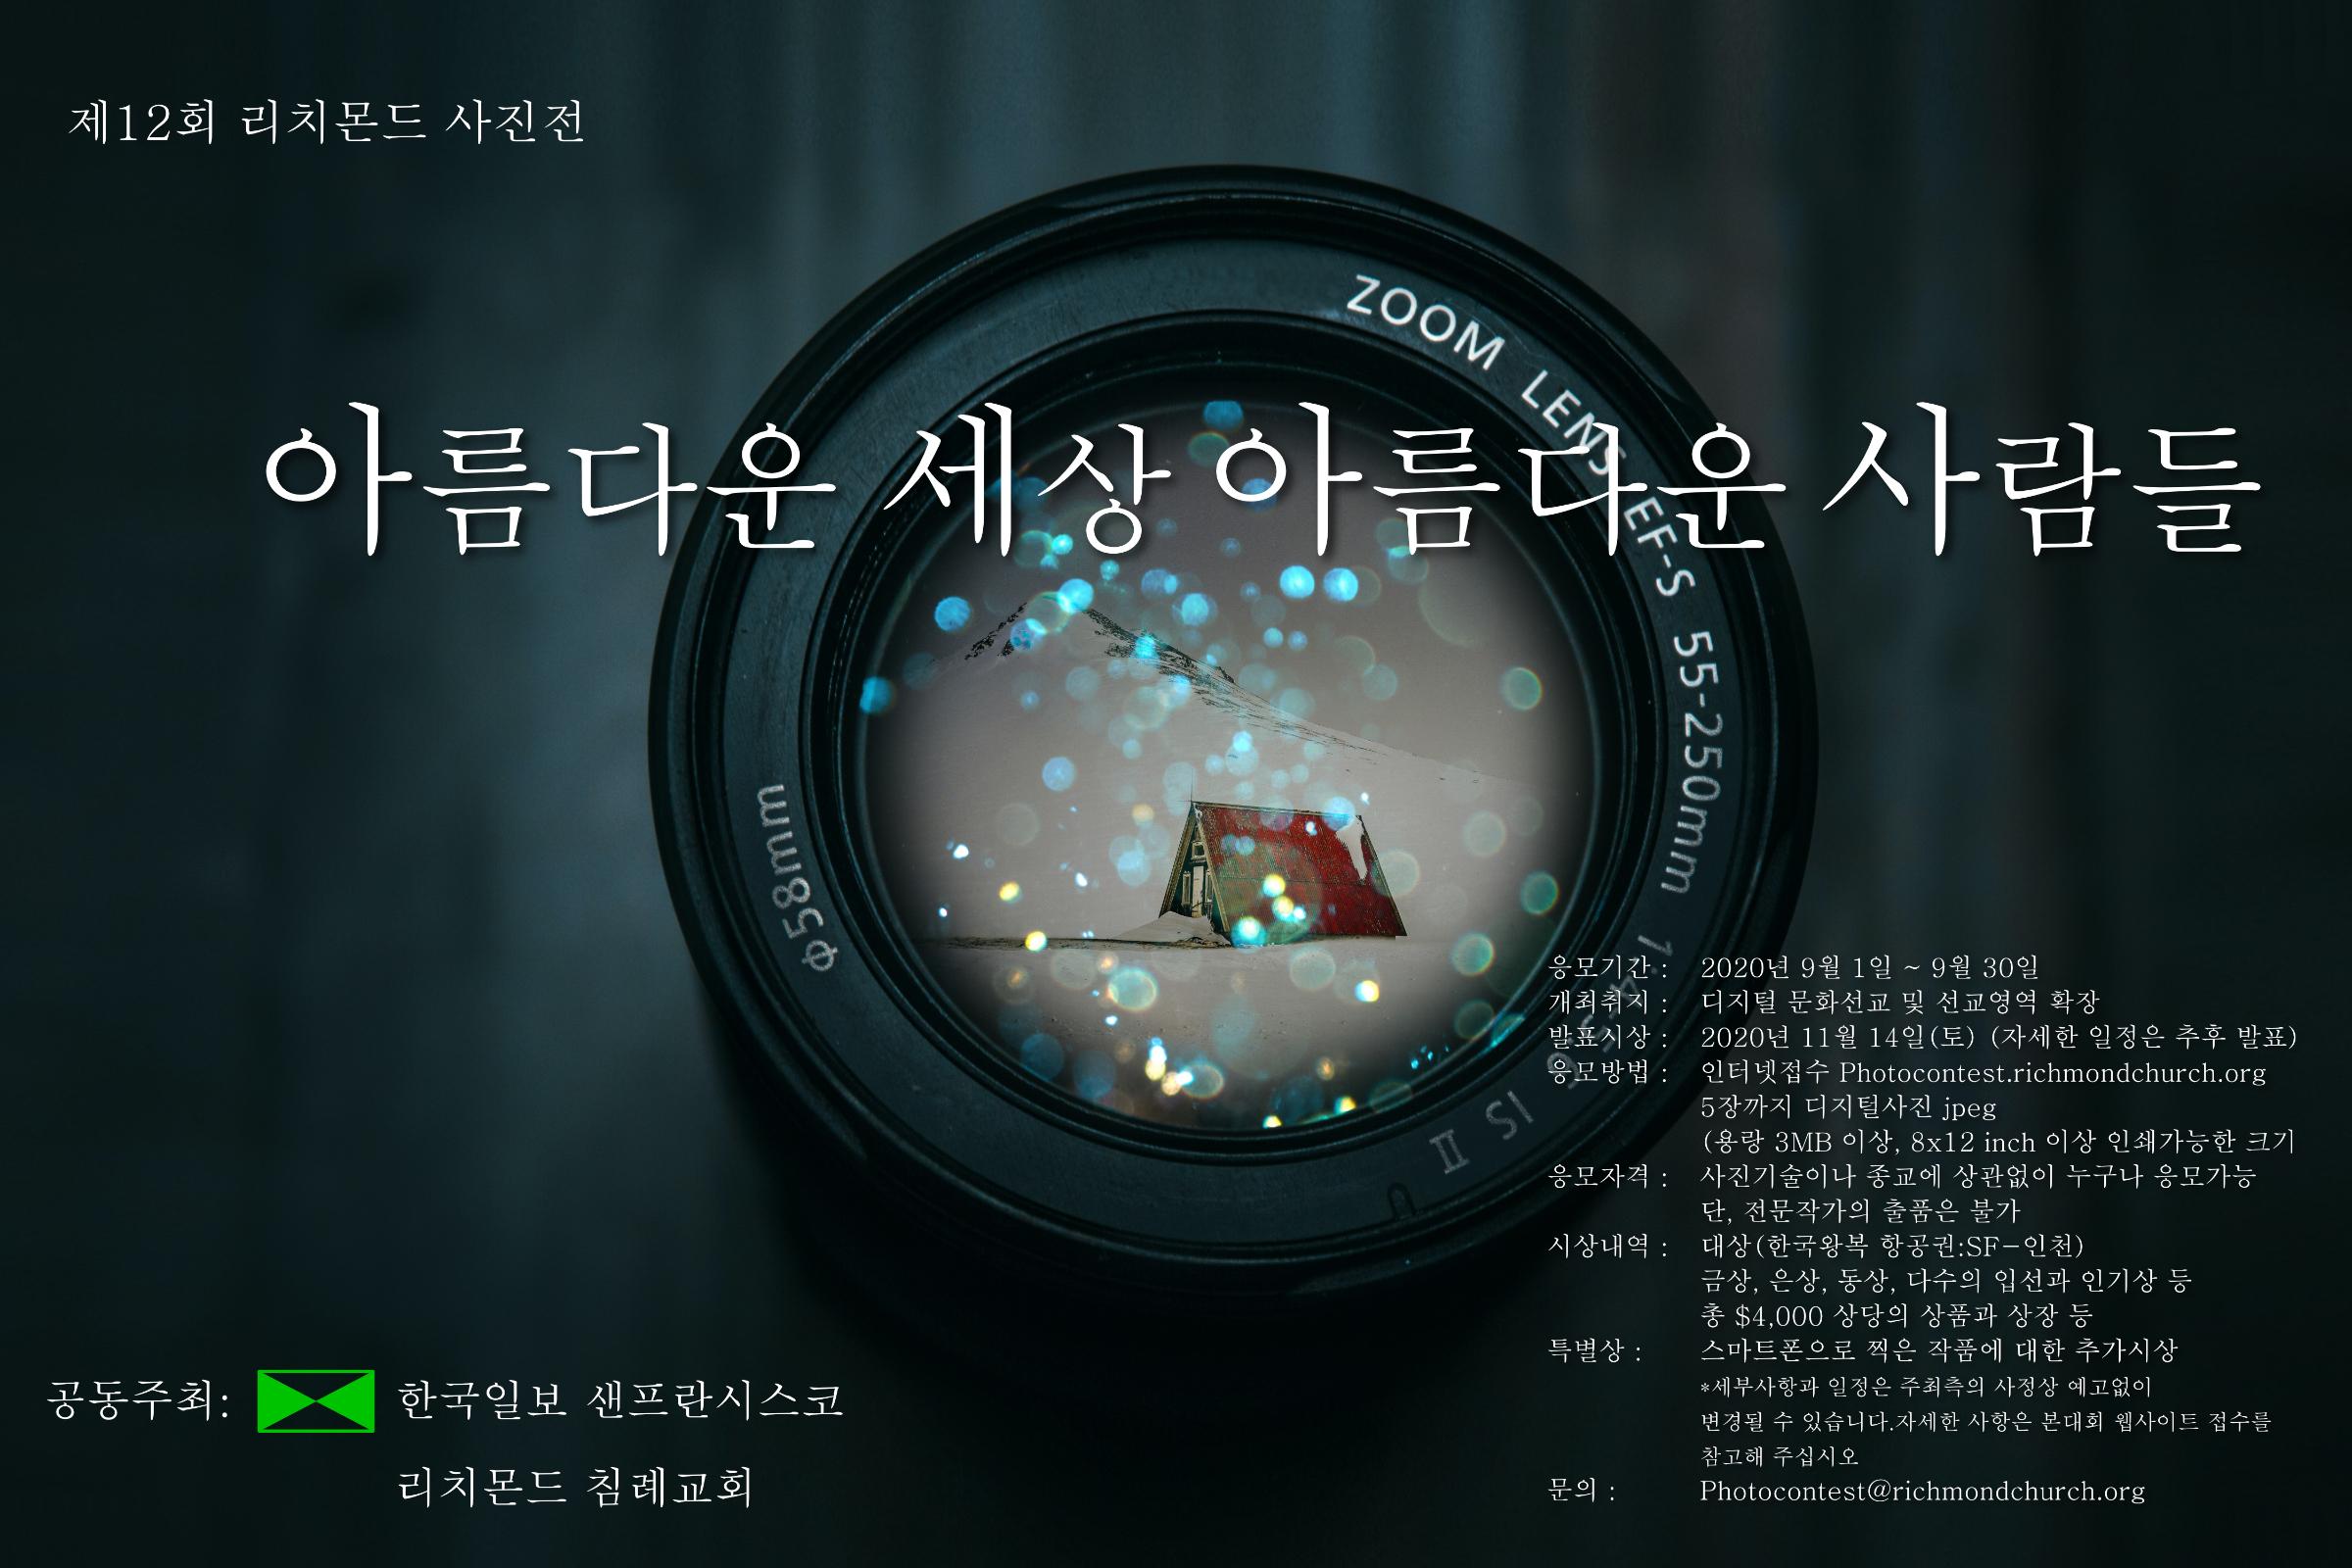 RKBC Photo Contest_R5_1.jpg